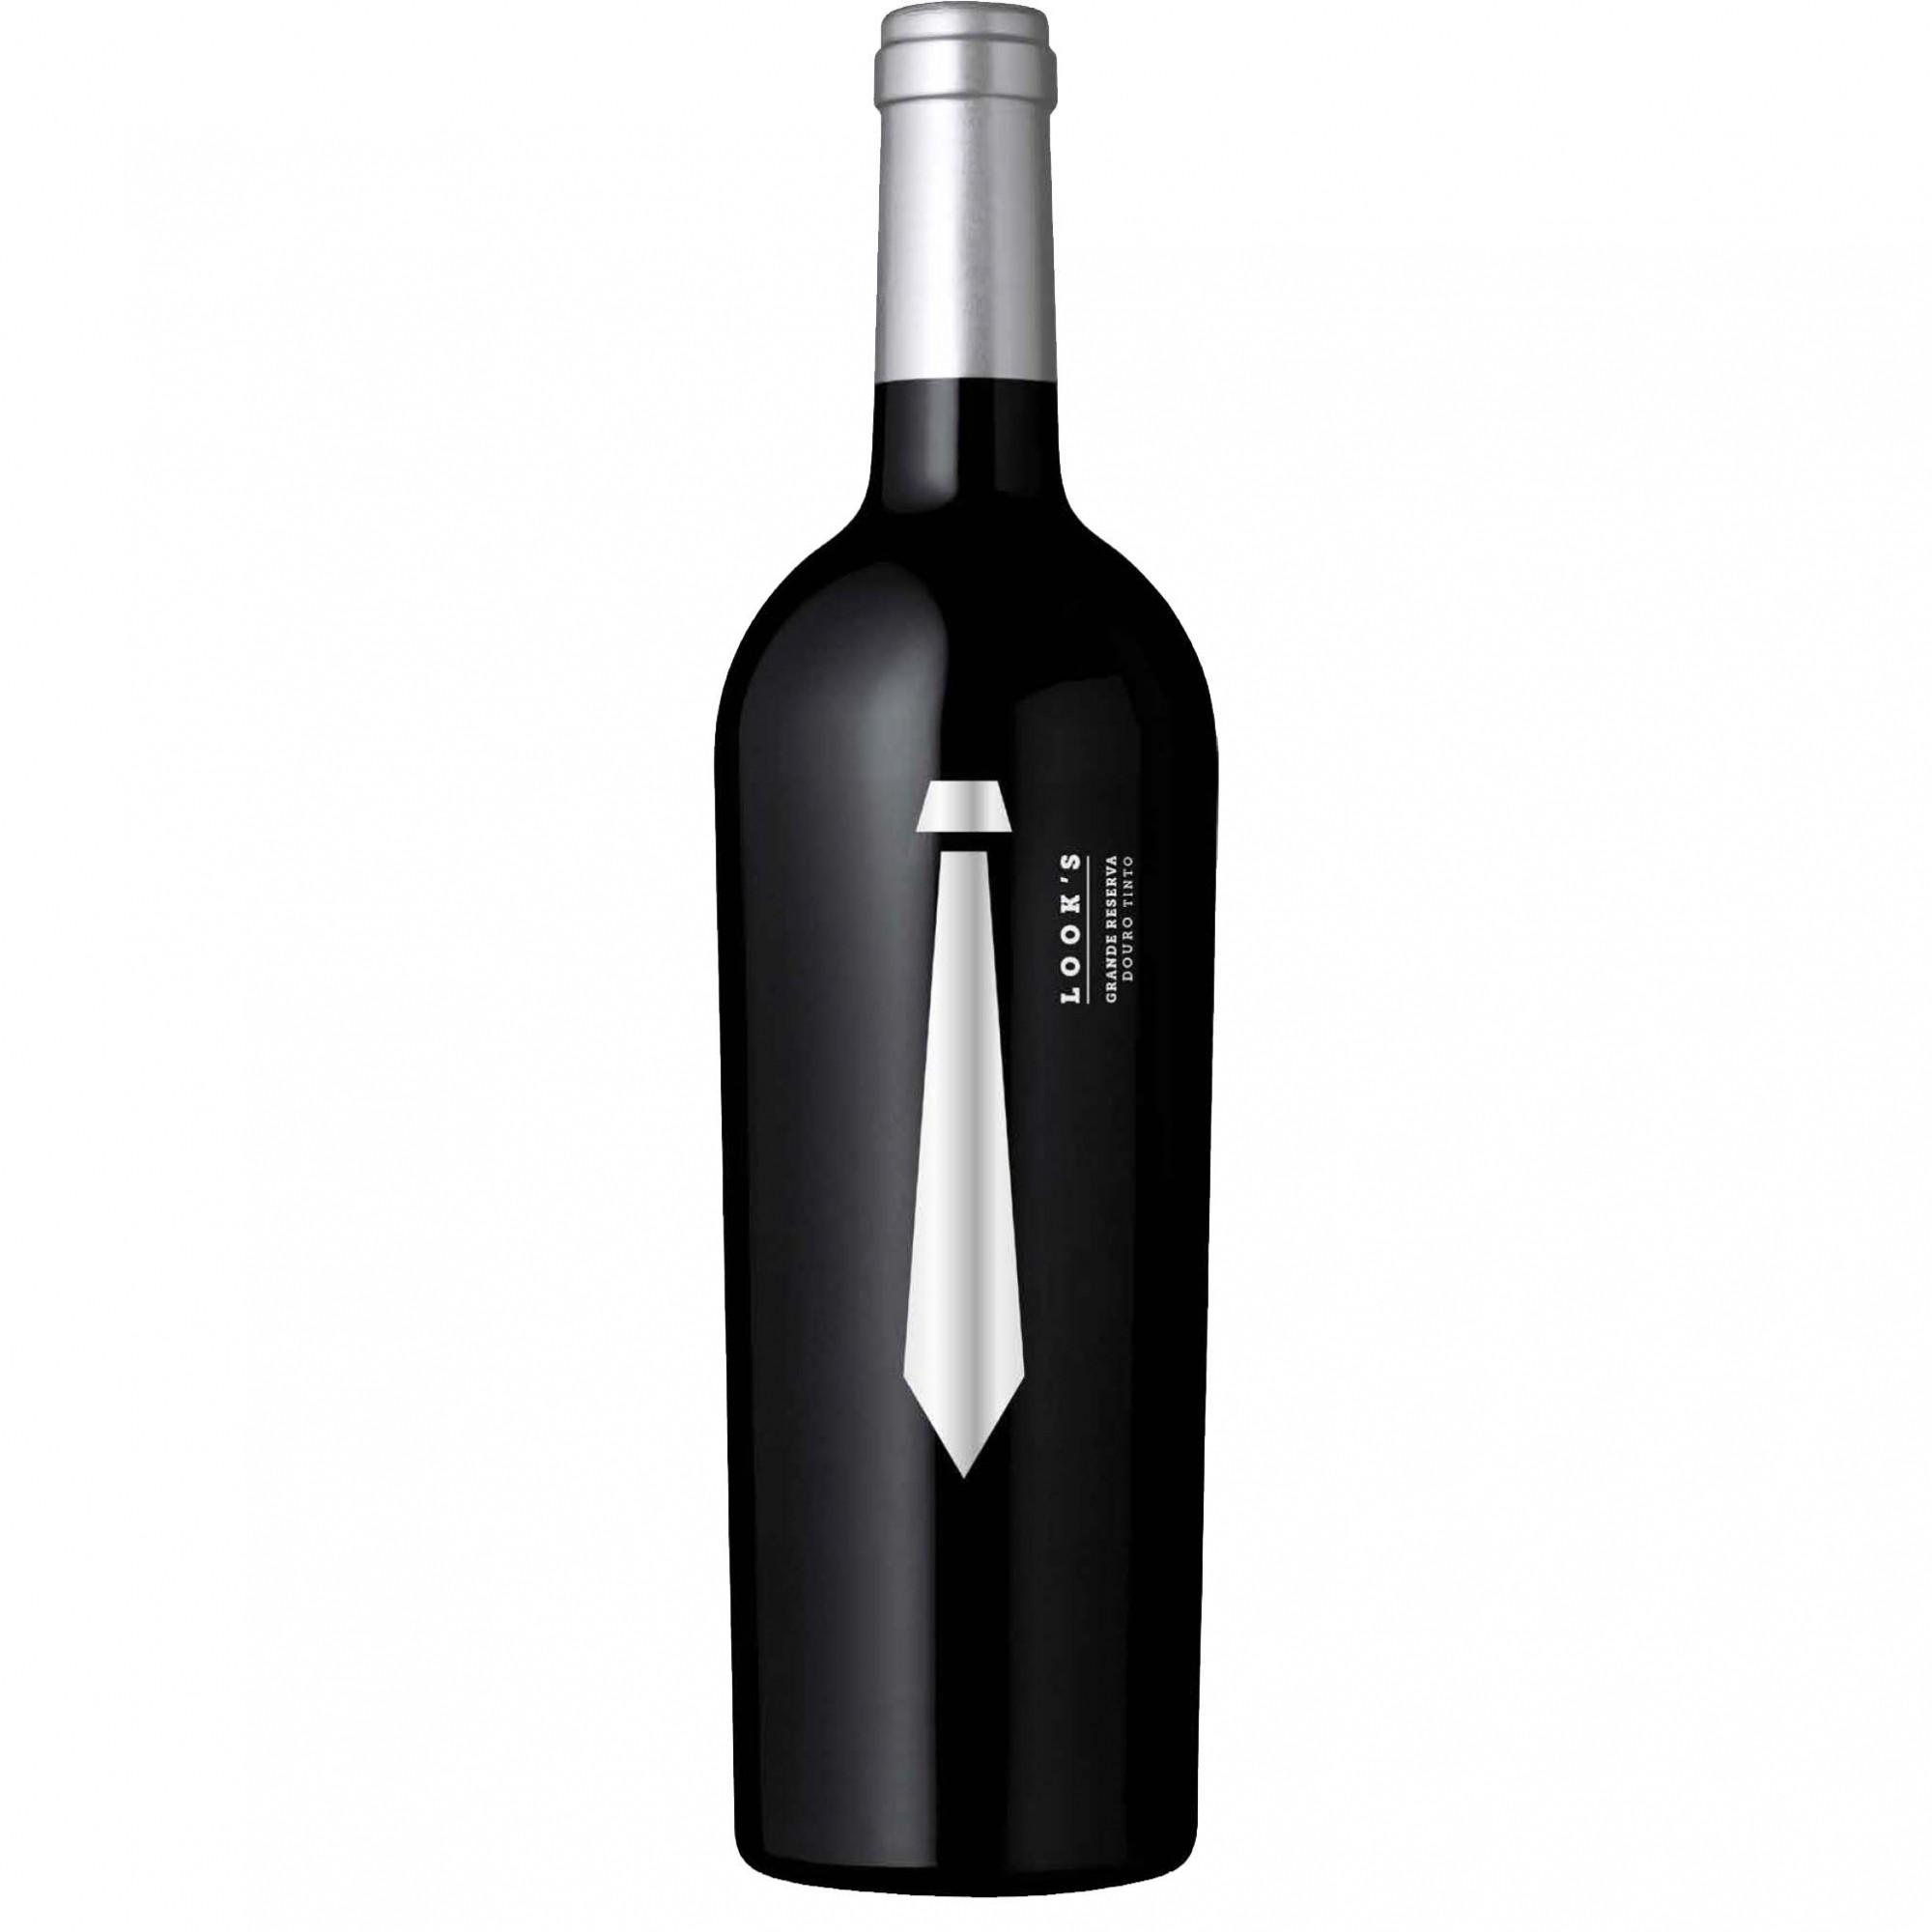 Vinho Tinto Look's Grande Reserva - 750ml -